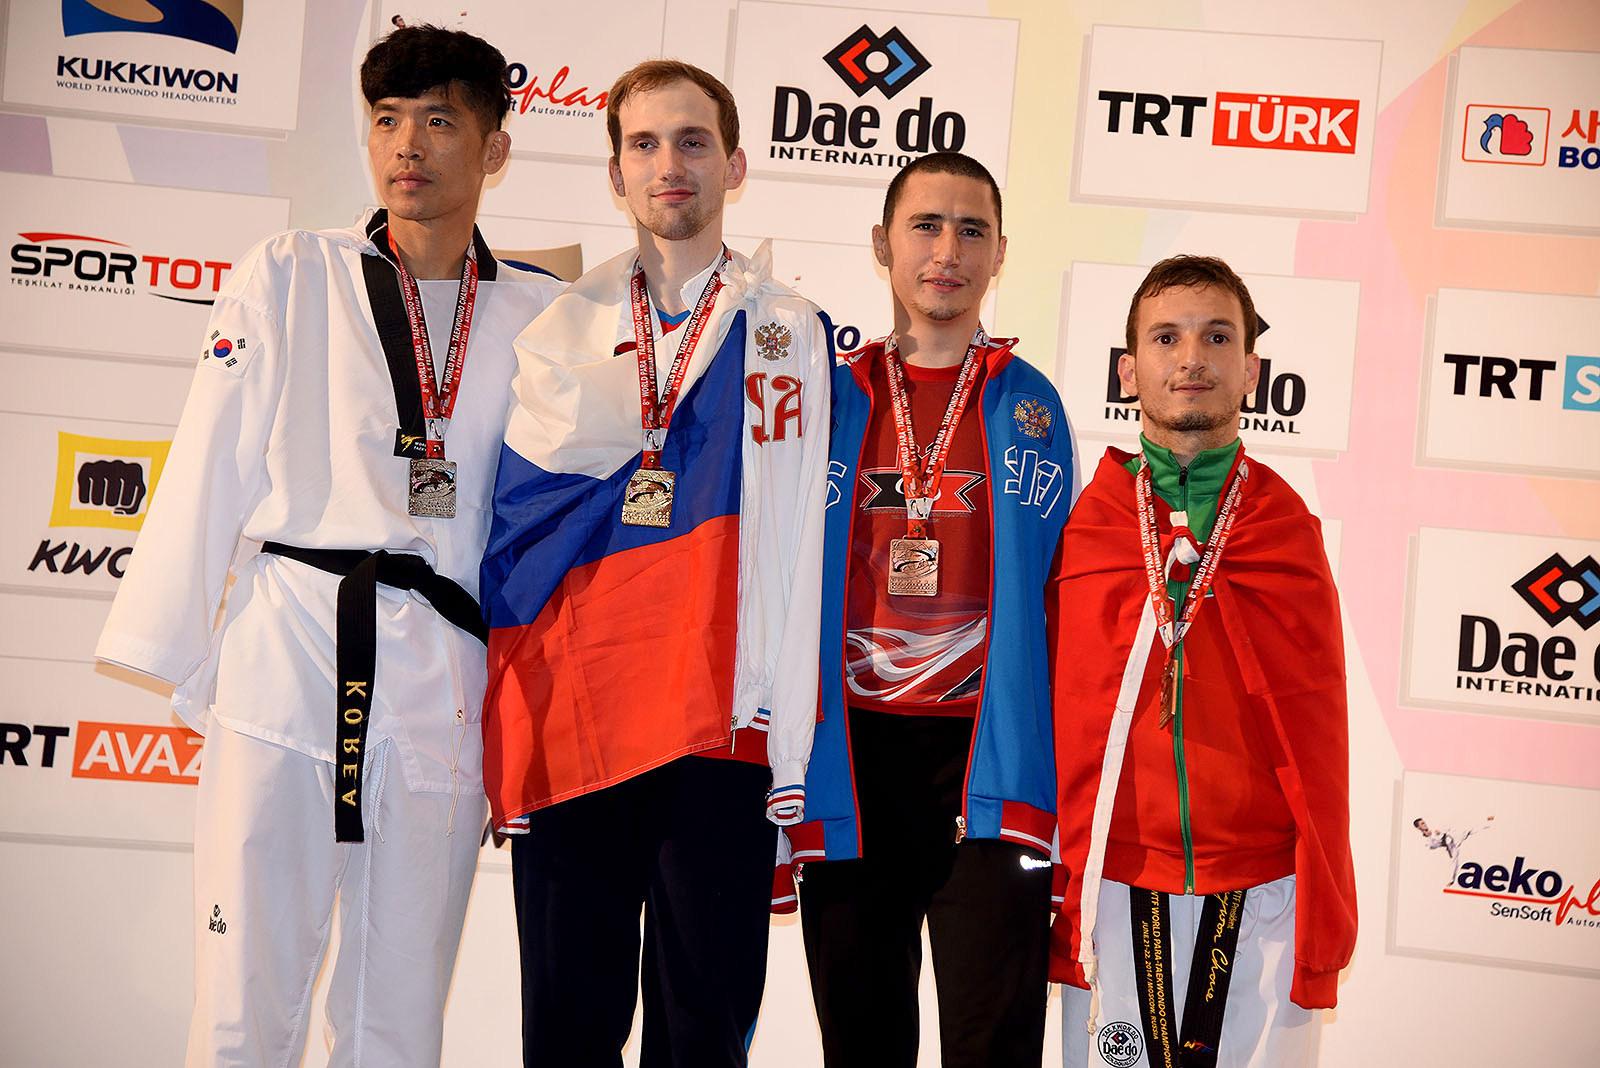 Awarding Ceremony_Russia,Russia, Kore